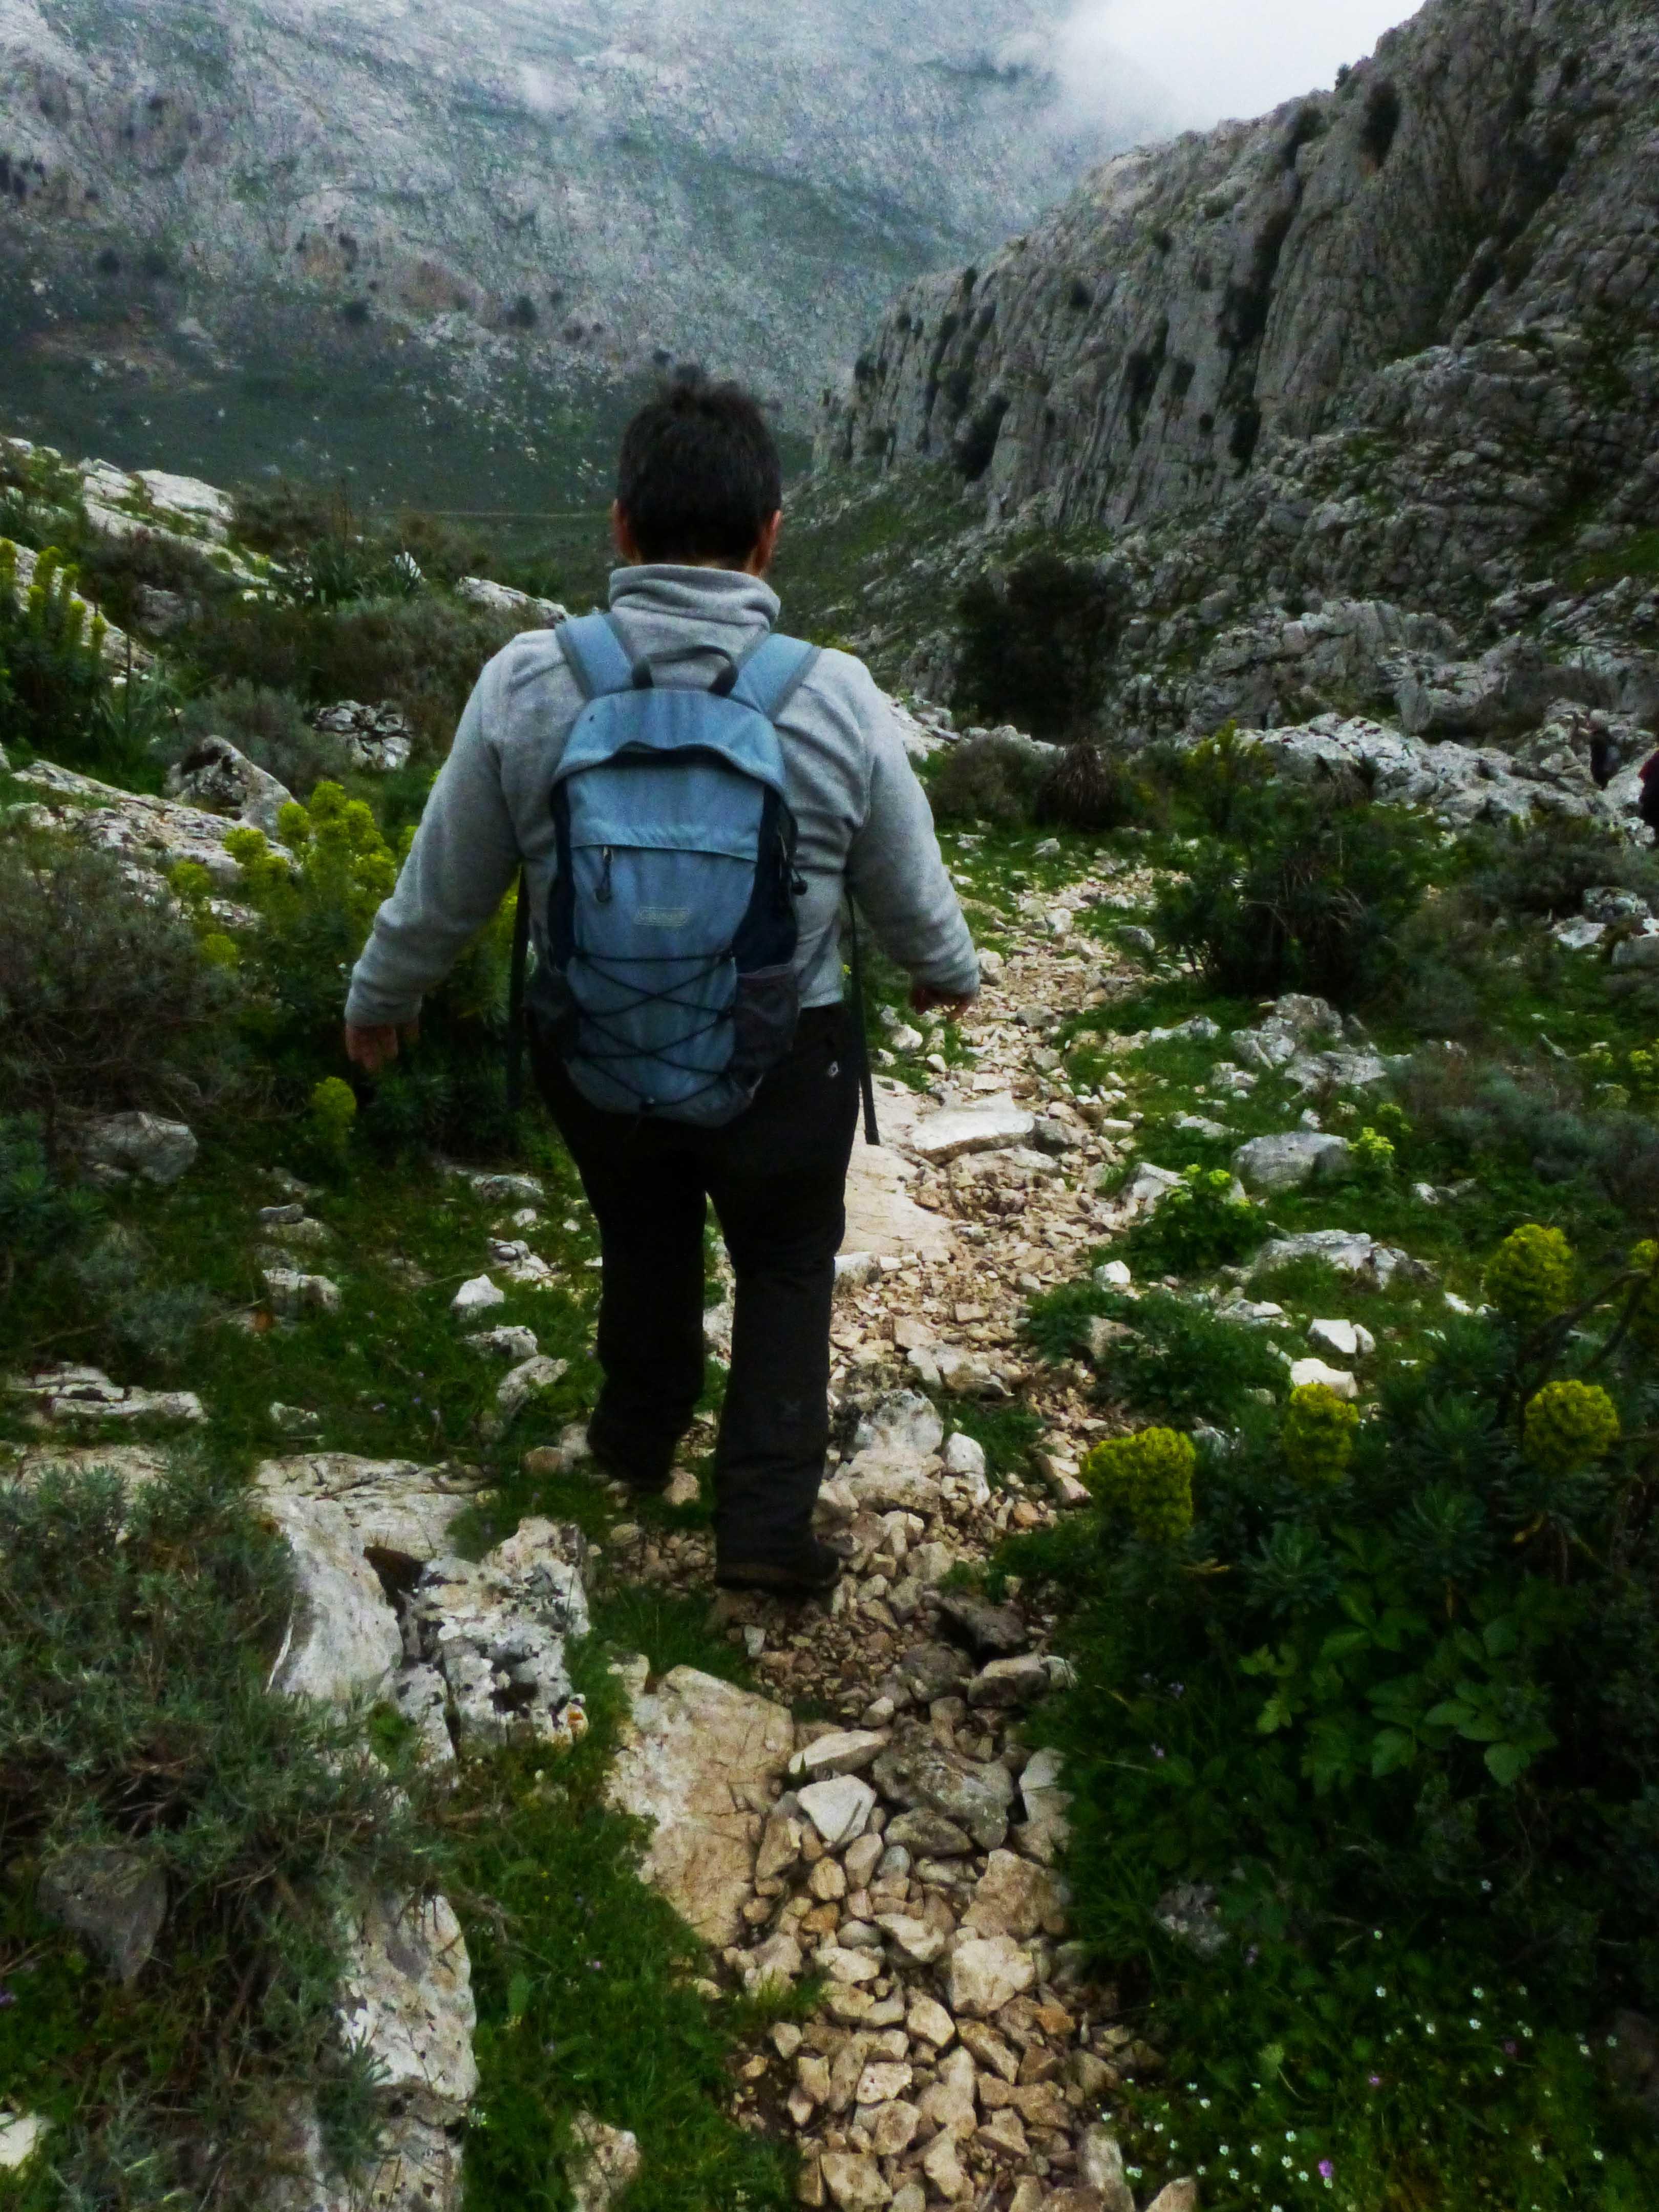 montalbo . il trekking